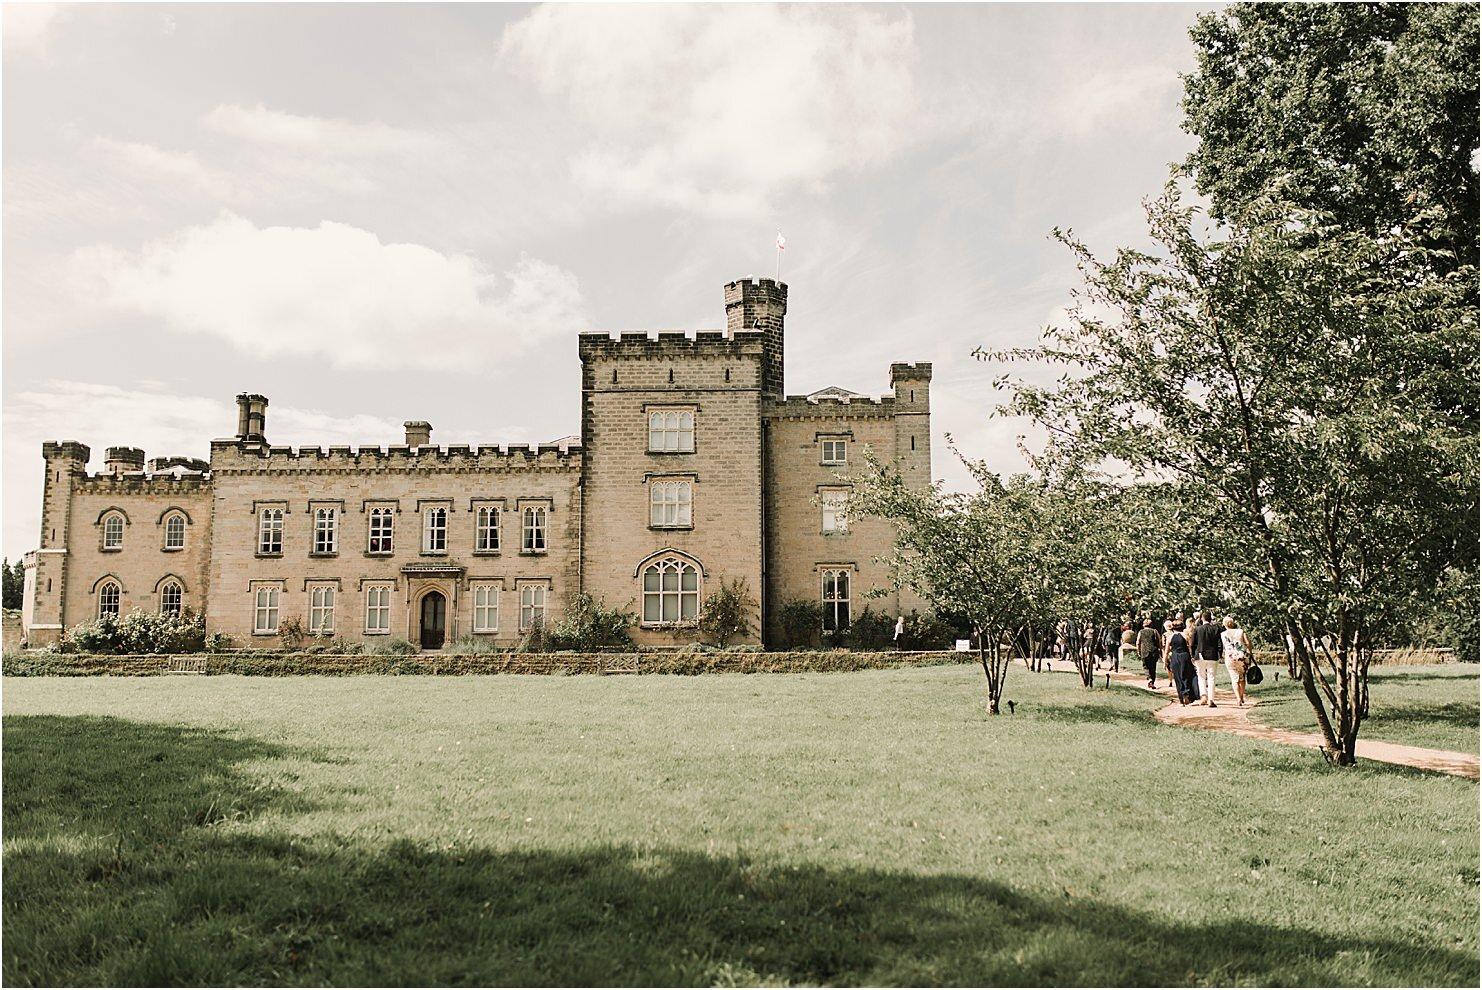 boda-de-cuento-en-castillo-boda-en-londres-36.jpg